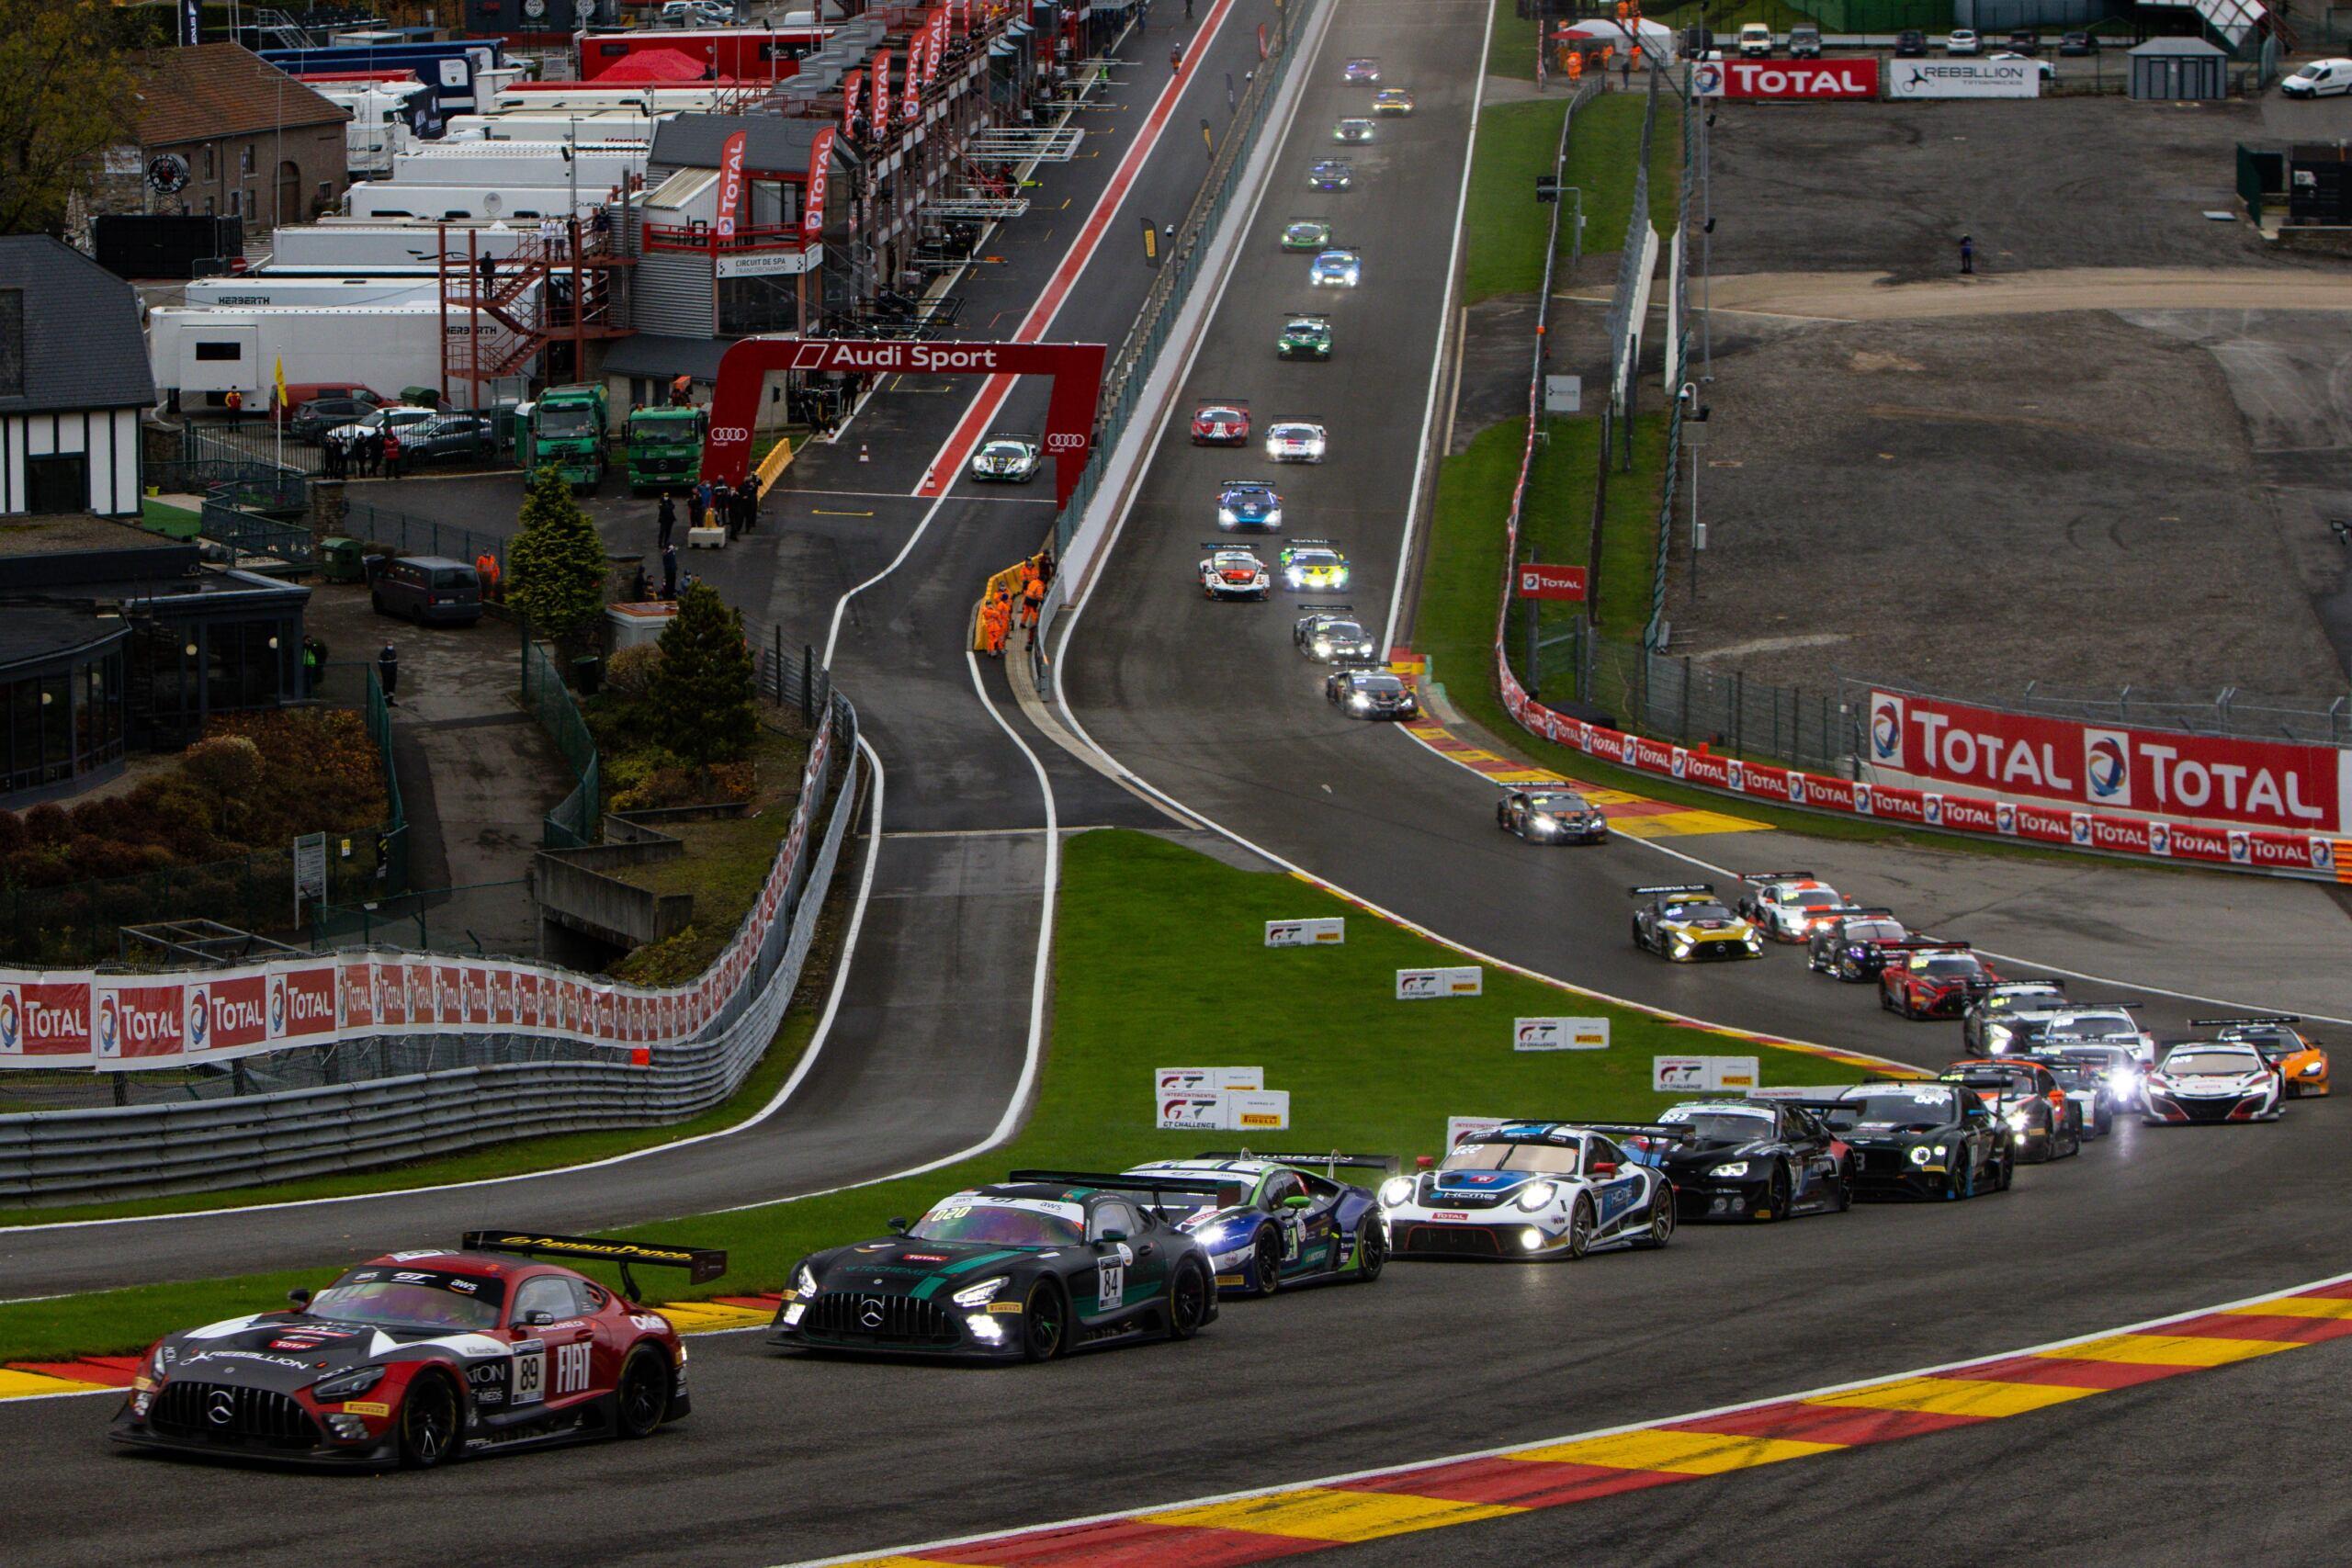 Mercedes-AMG Motorsport 50° anniversario 24 Ore Spa